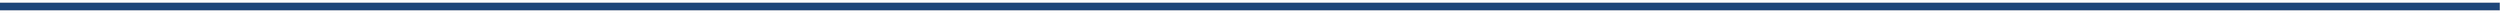 Blue Dividing Line.jpg